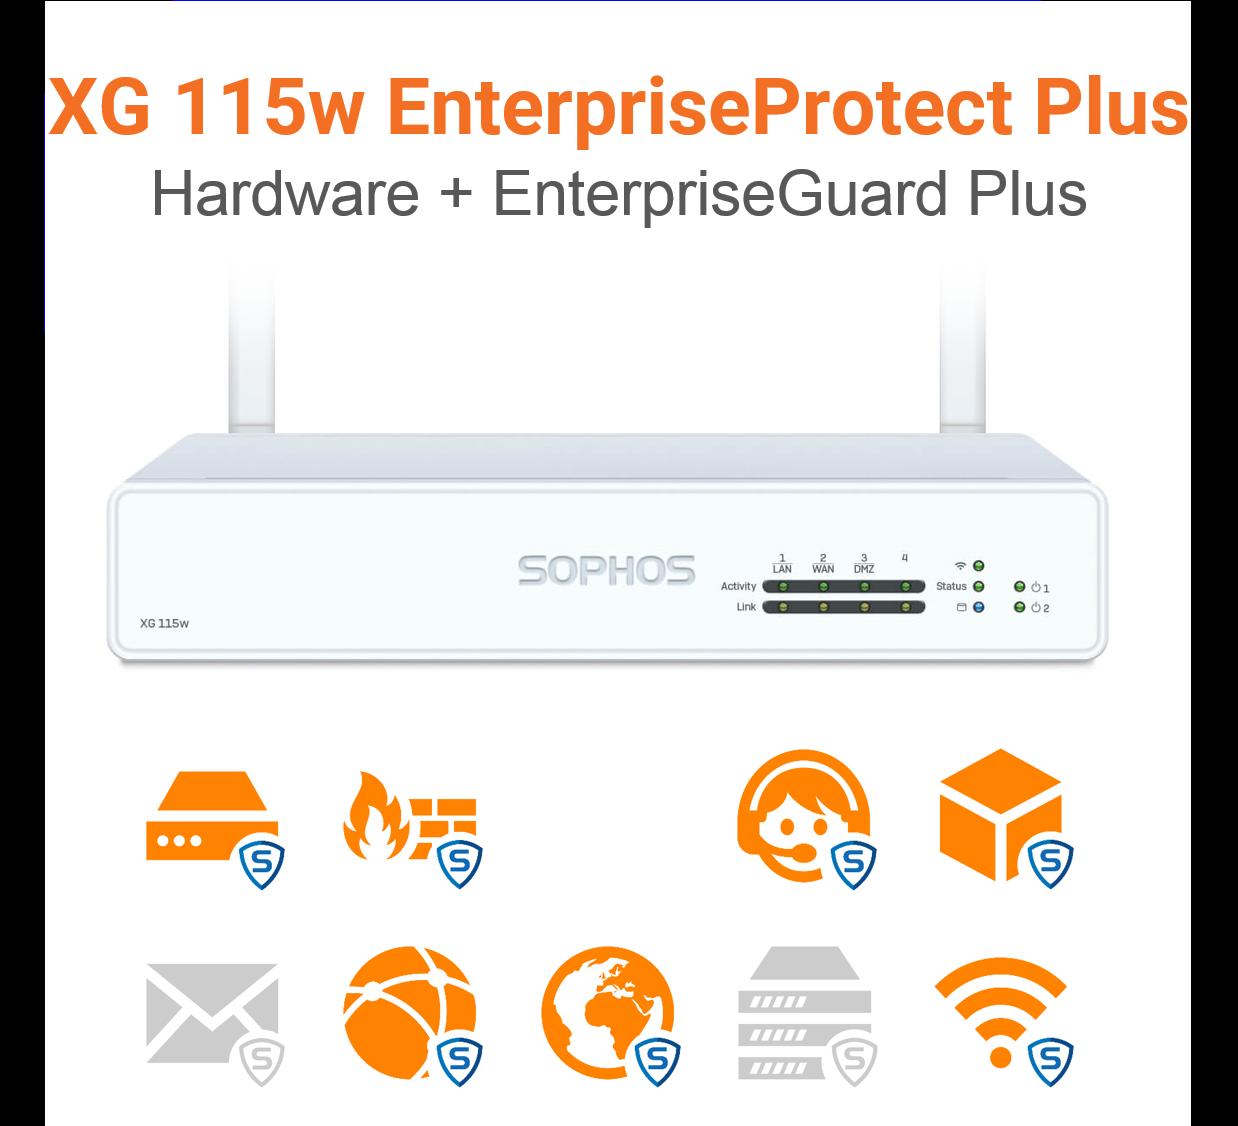 Sophos XG 115w EnterpriseProtect Plus Bundle (Hardware + Lizenz)